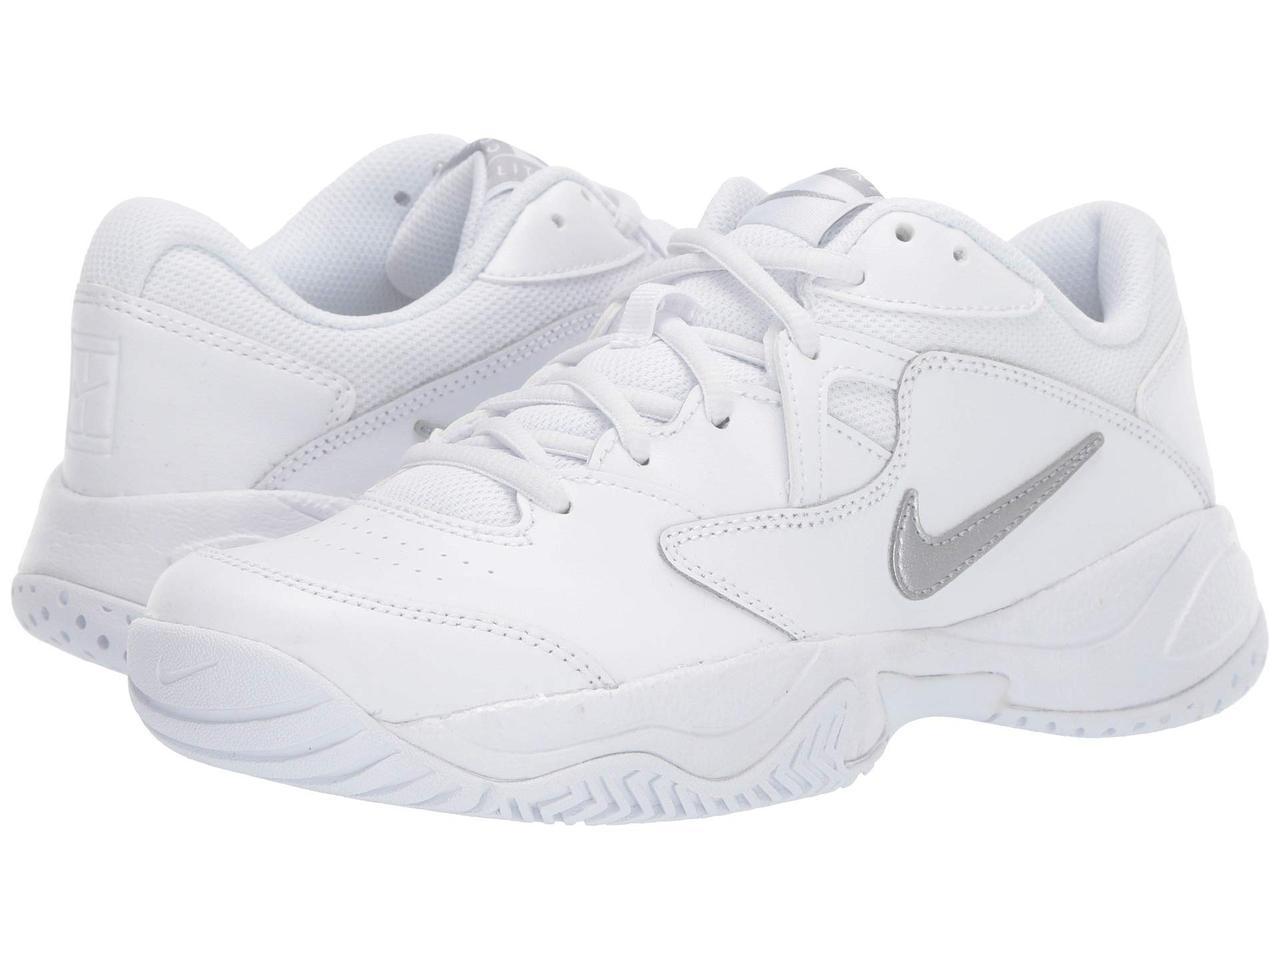 Кроссовки/Кеды (Оригинал) Nike Court Lite 2 White/Metallic Silver/White